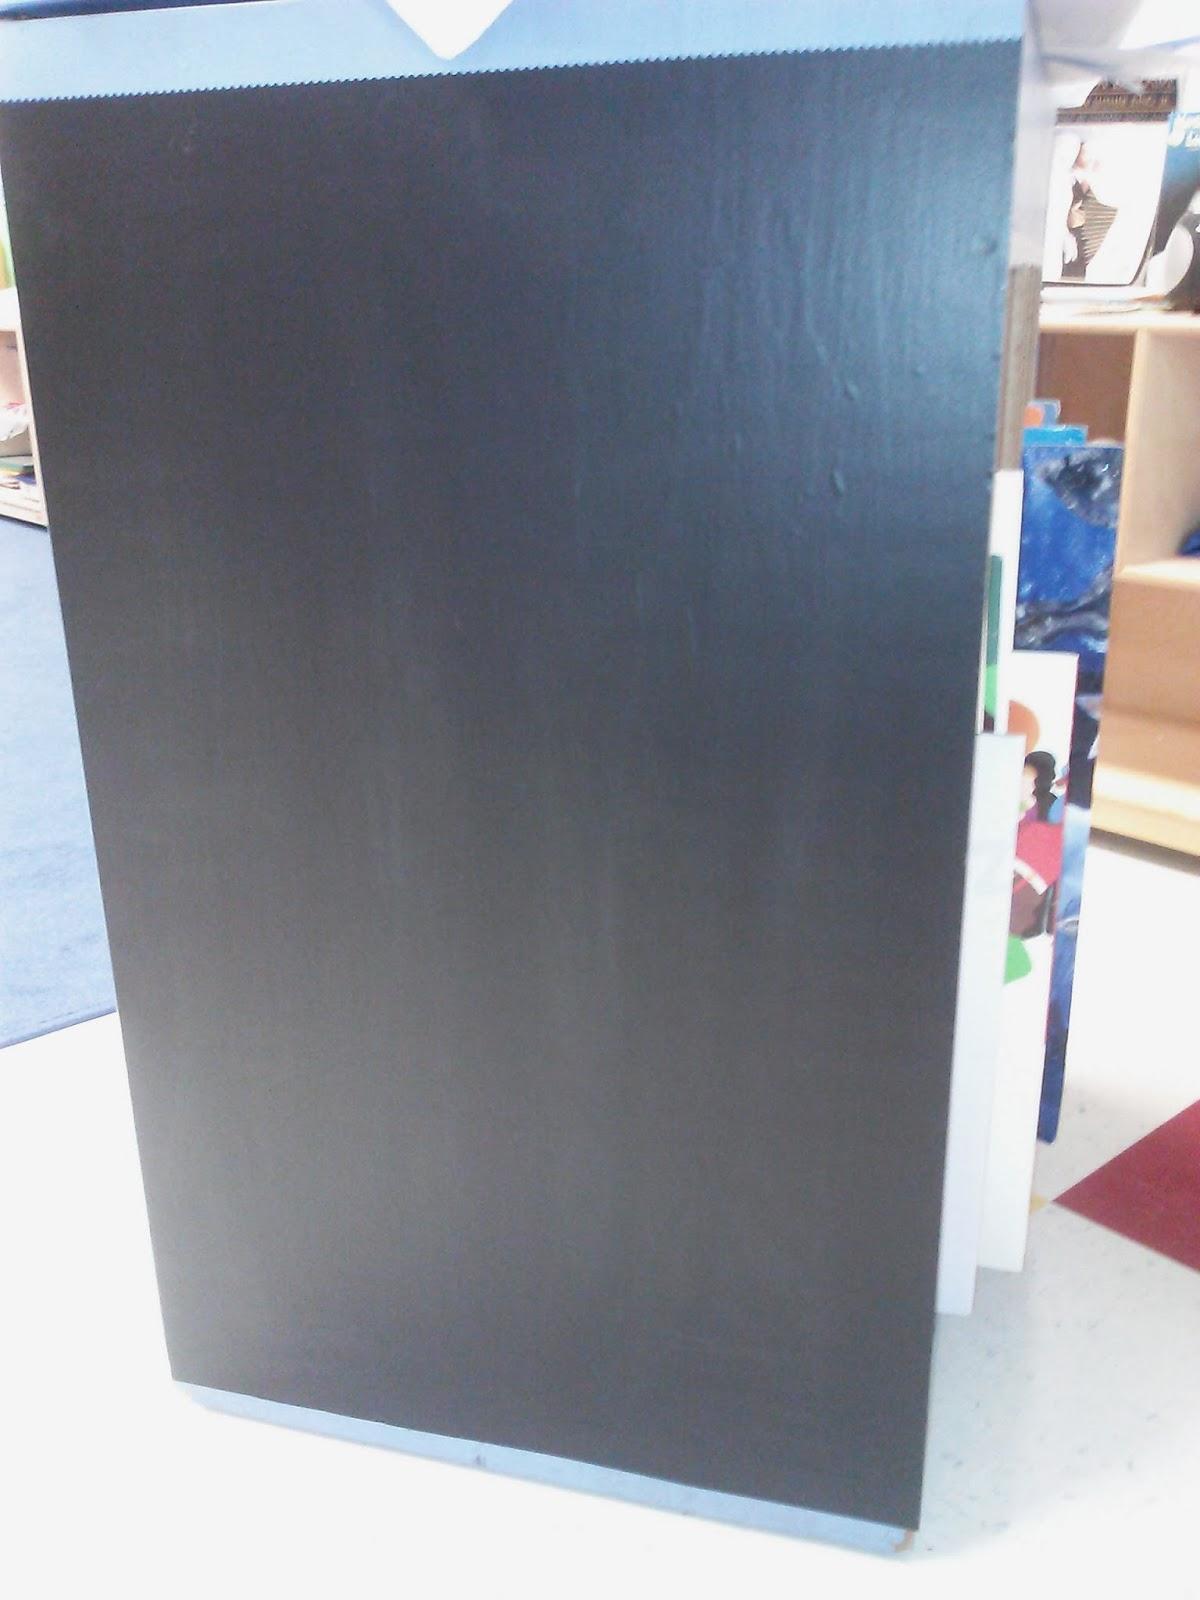 theresa s teaching tidbits big book stand makeover